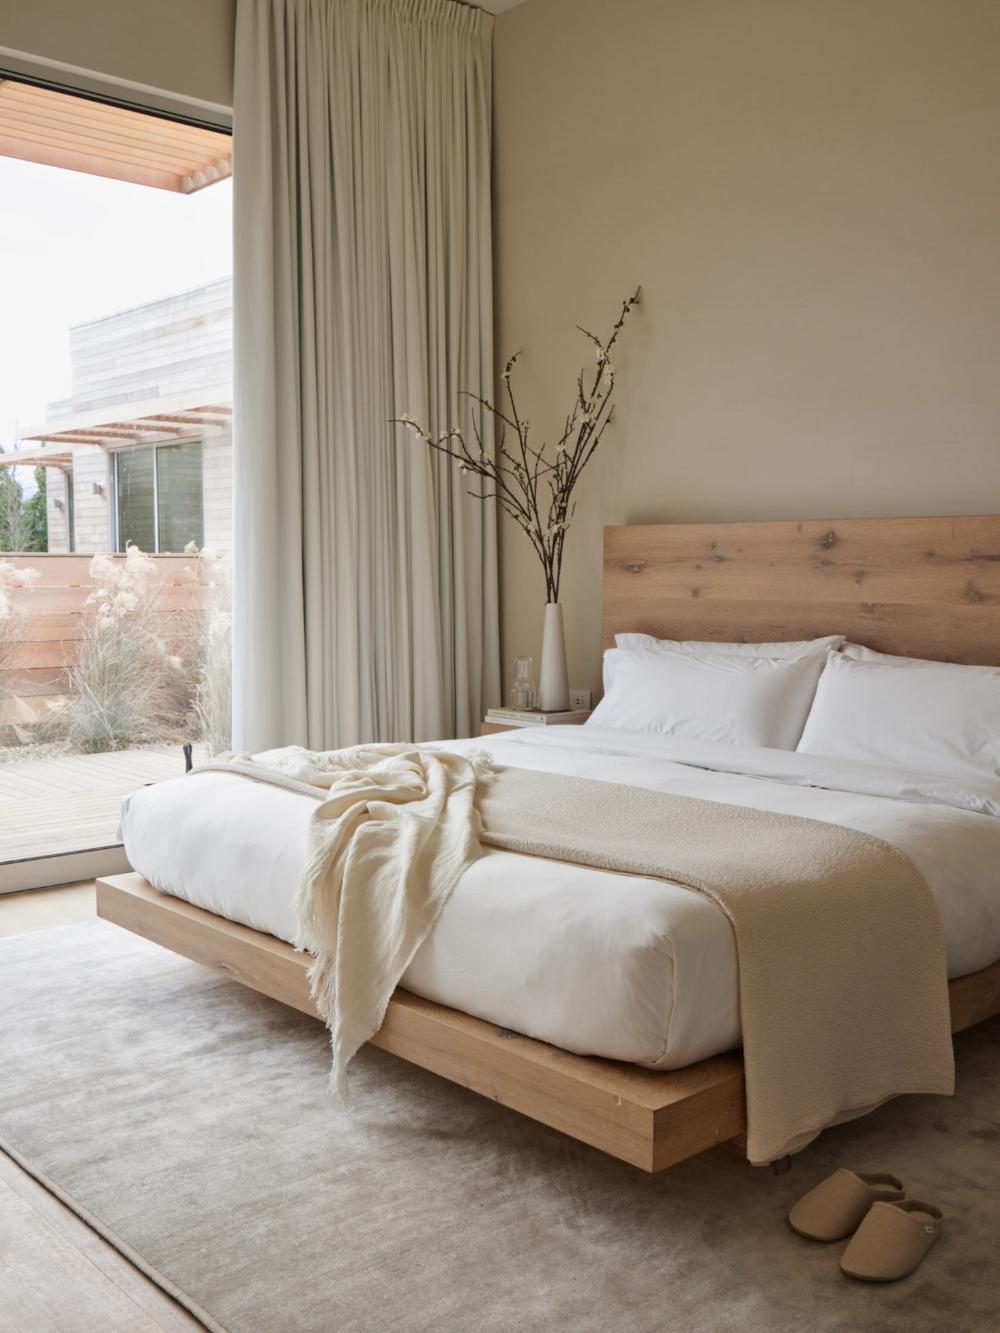 Shou Sugi Ban House: A Japanese-Inspired Wellness Retreat in the Hamptons